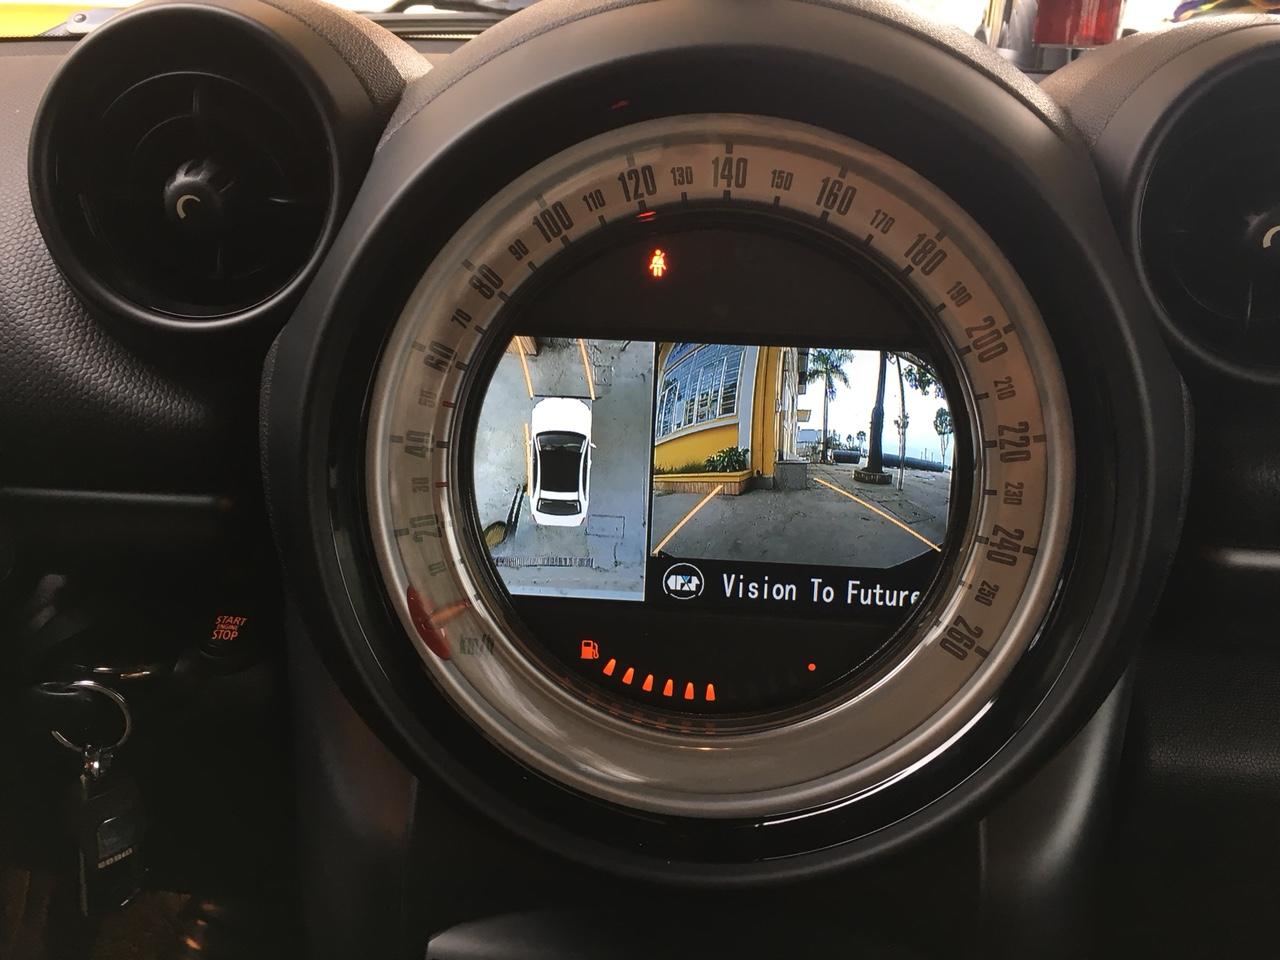 camera-360-oris-lap-tren-xe-mini-cooper-s-2012